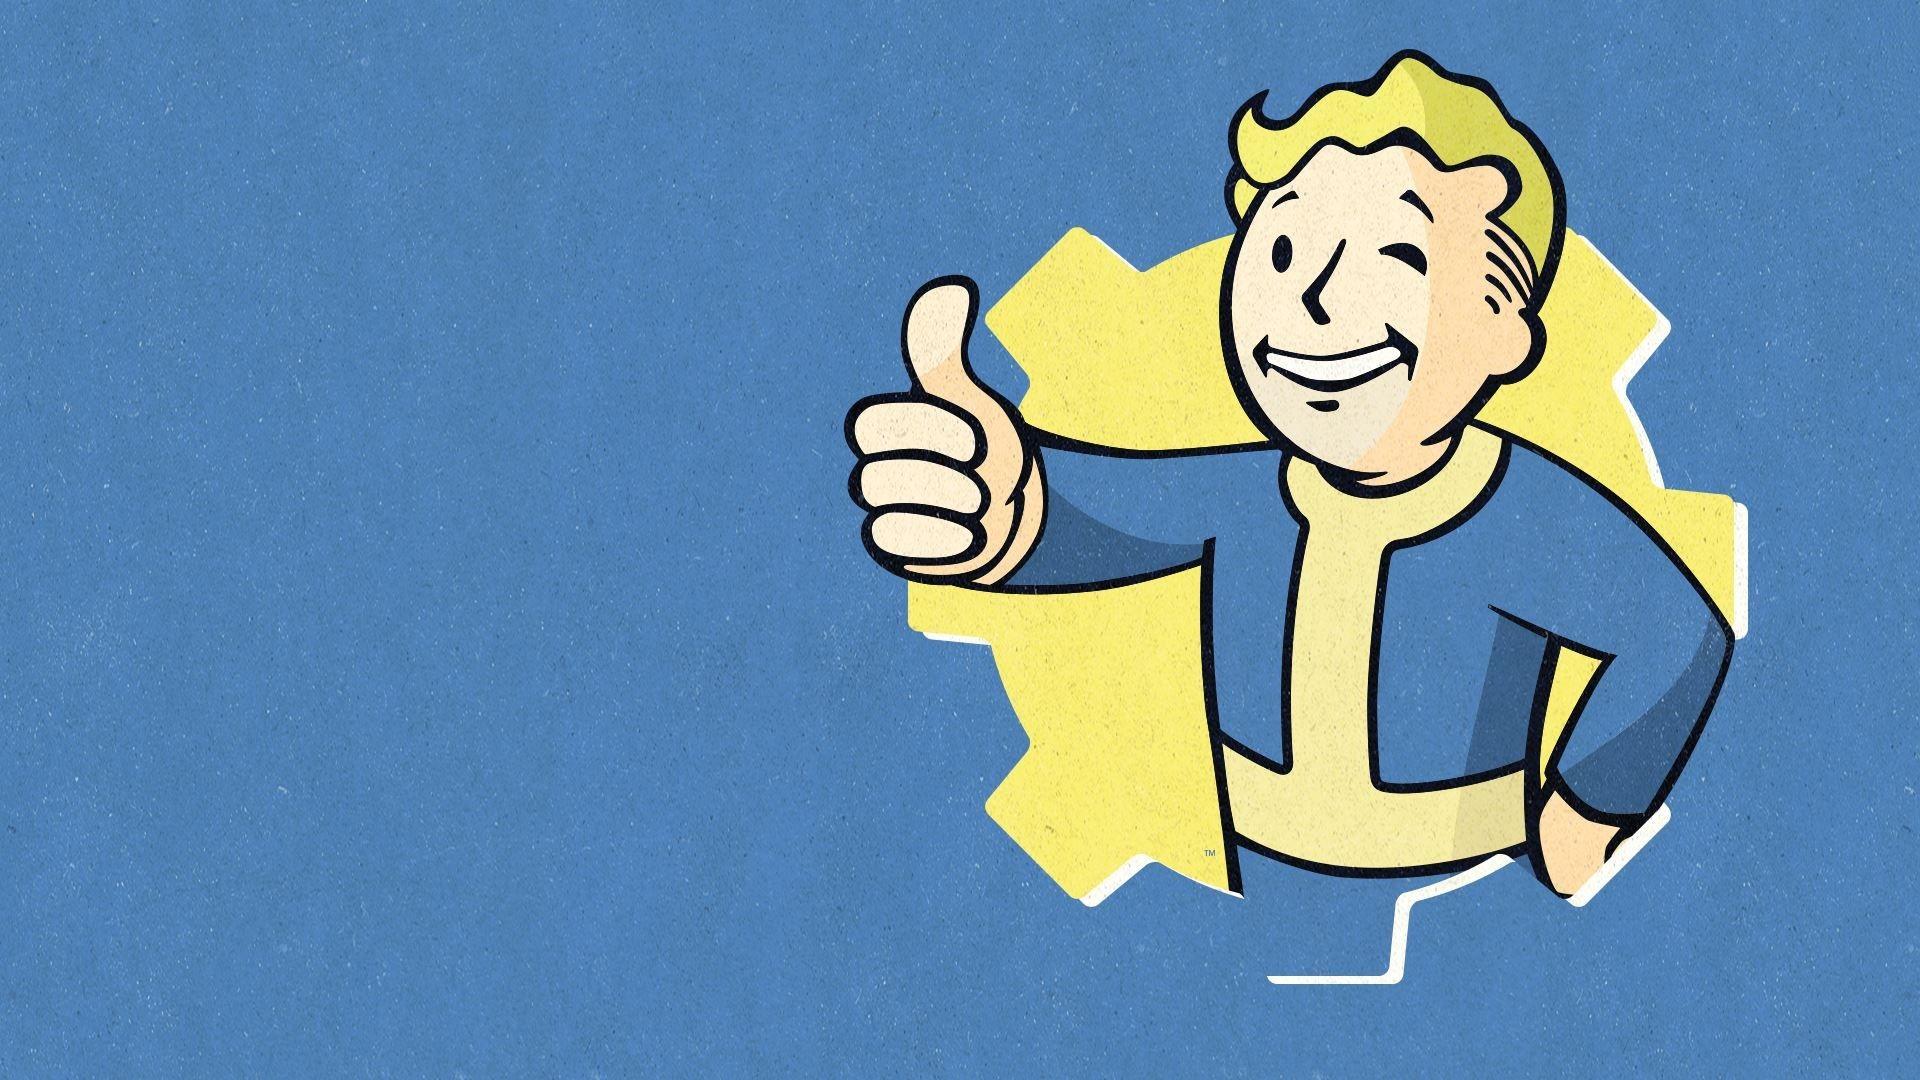 Fondos De Pantalla Wallpapers Gratis: Fondos De Pantalla De Fallout 4, Wallpapers HD Gratis